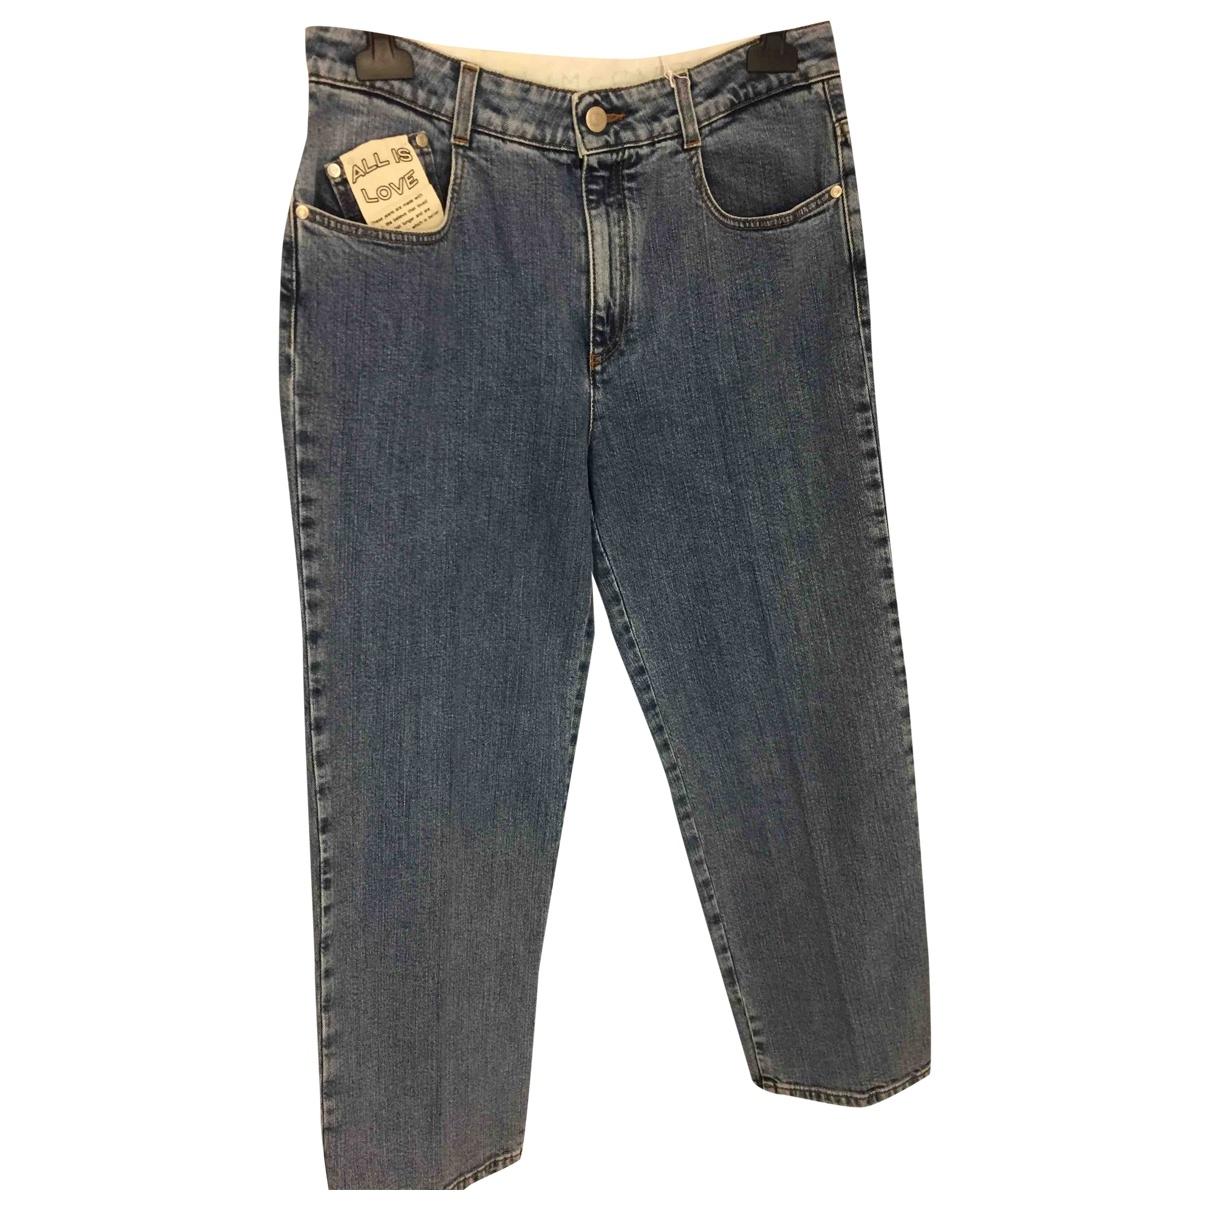 Stella Mccartney \N Blue Cotton Jeans for Women 30 US